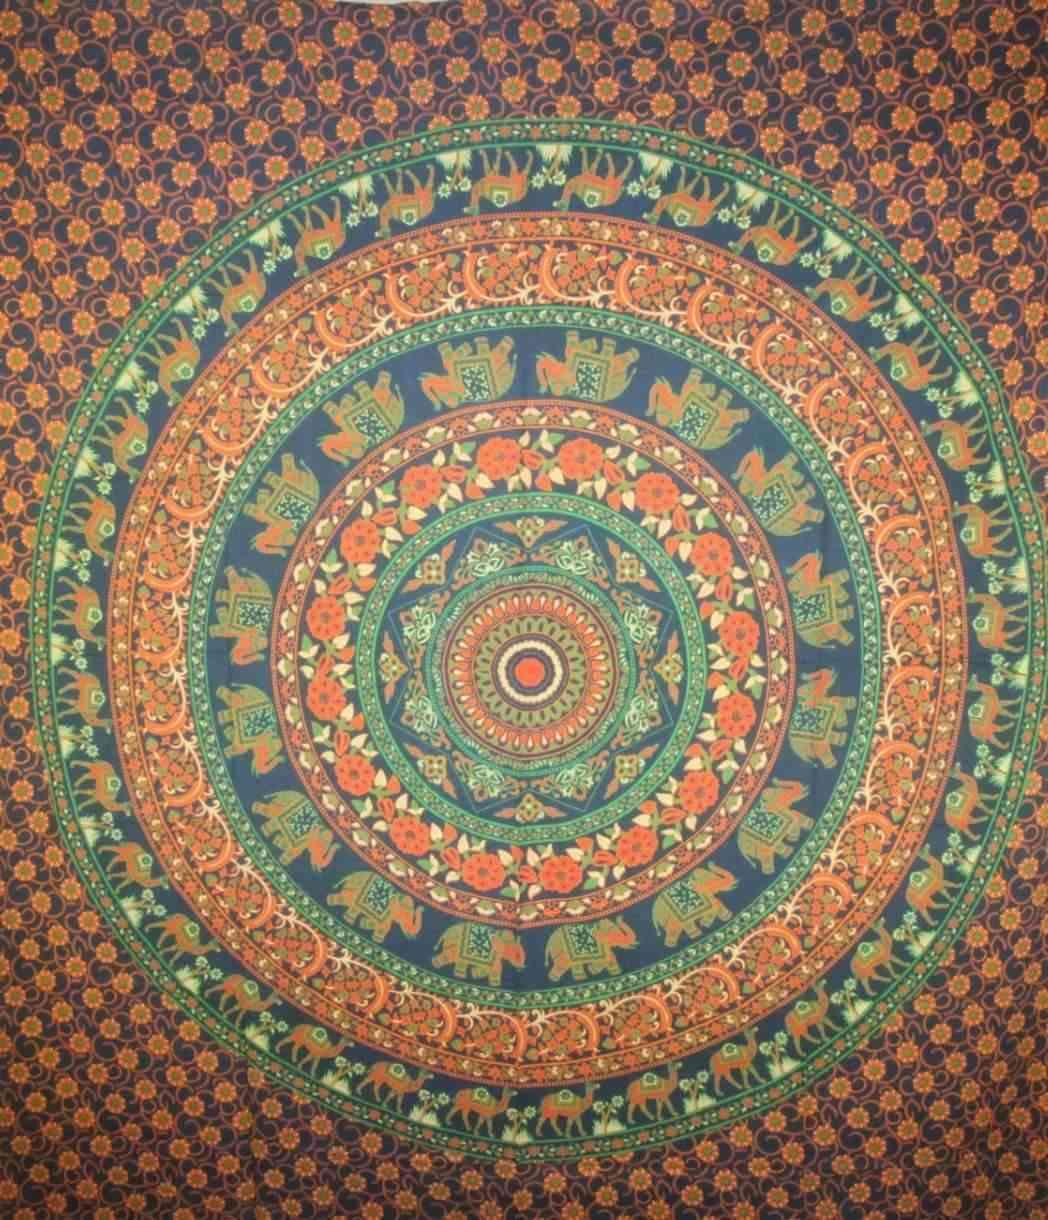 Dark Blue, Kaleidoscope, Mandala Flowers & Animals Tapestry